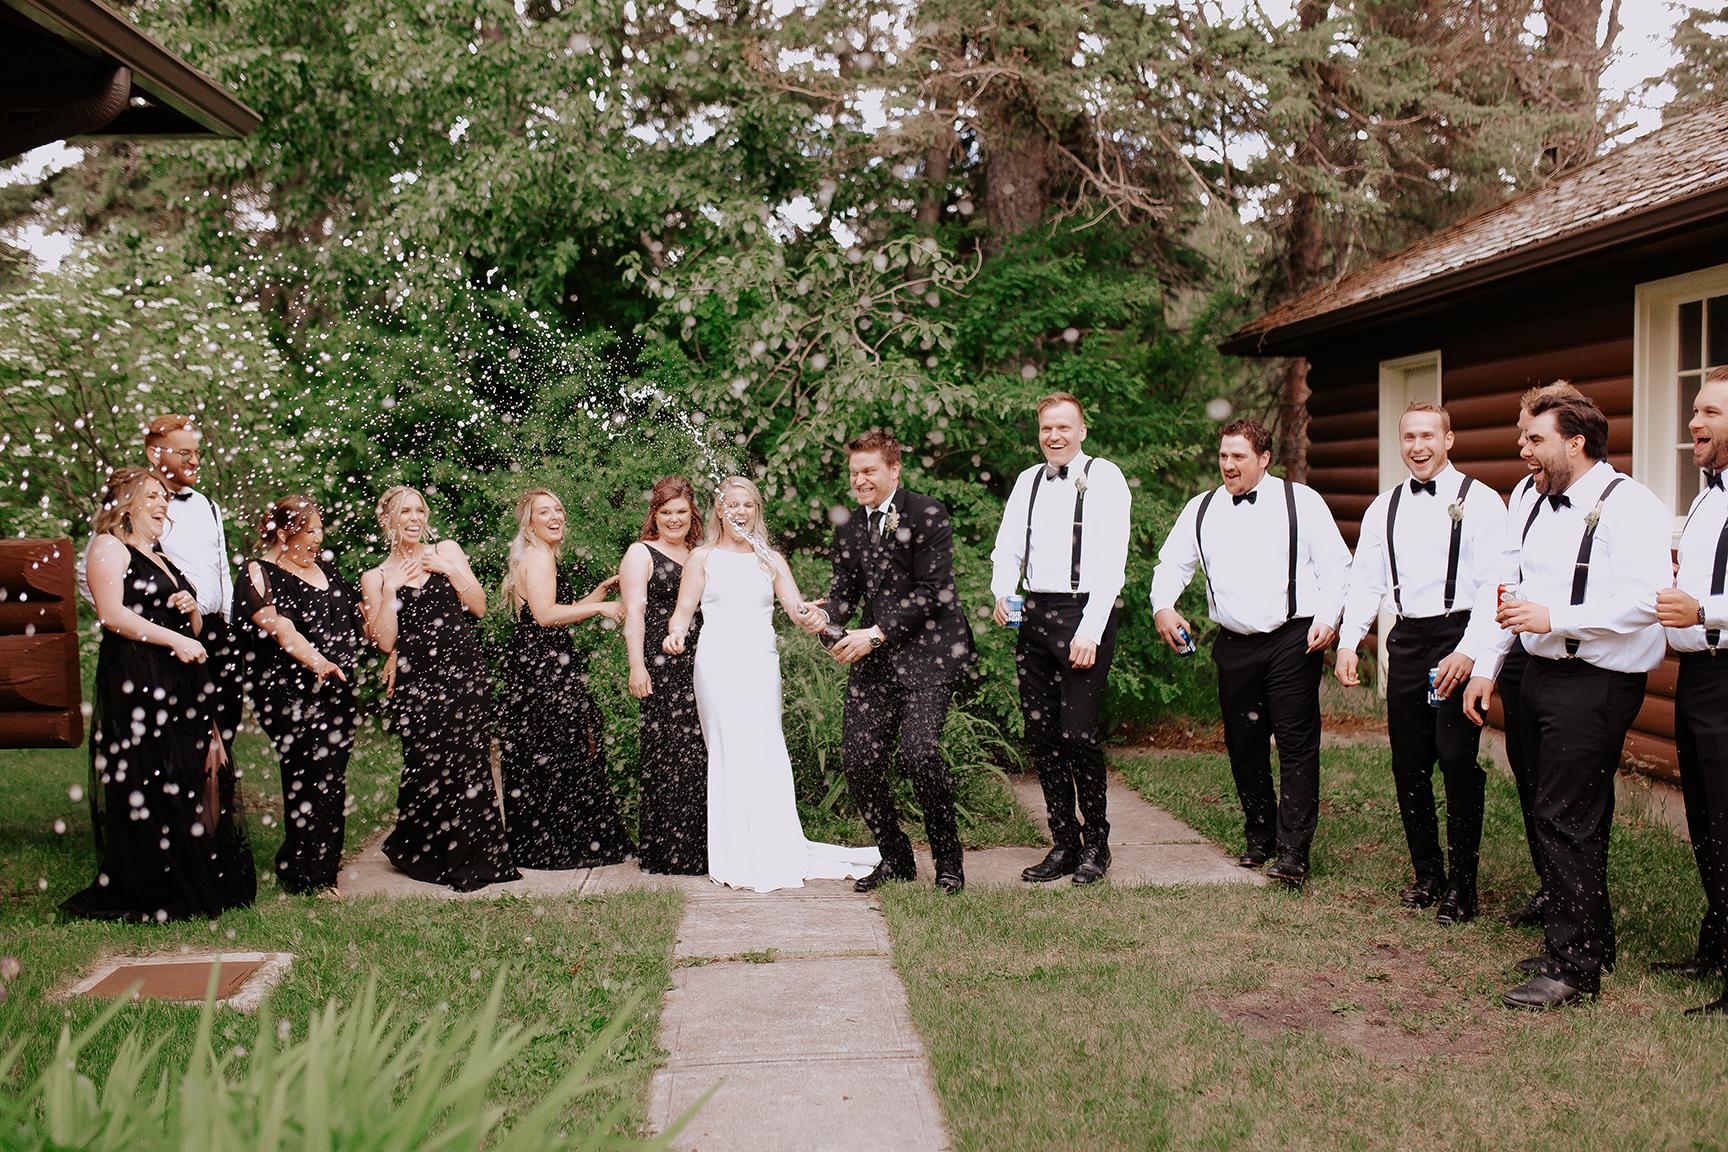 Bridal_Party_232_web.jpg